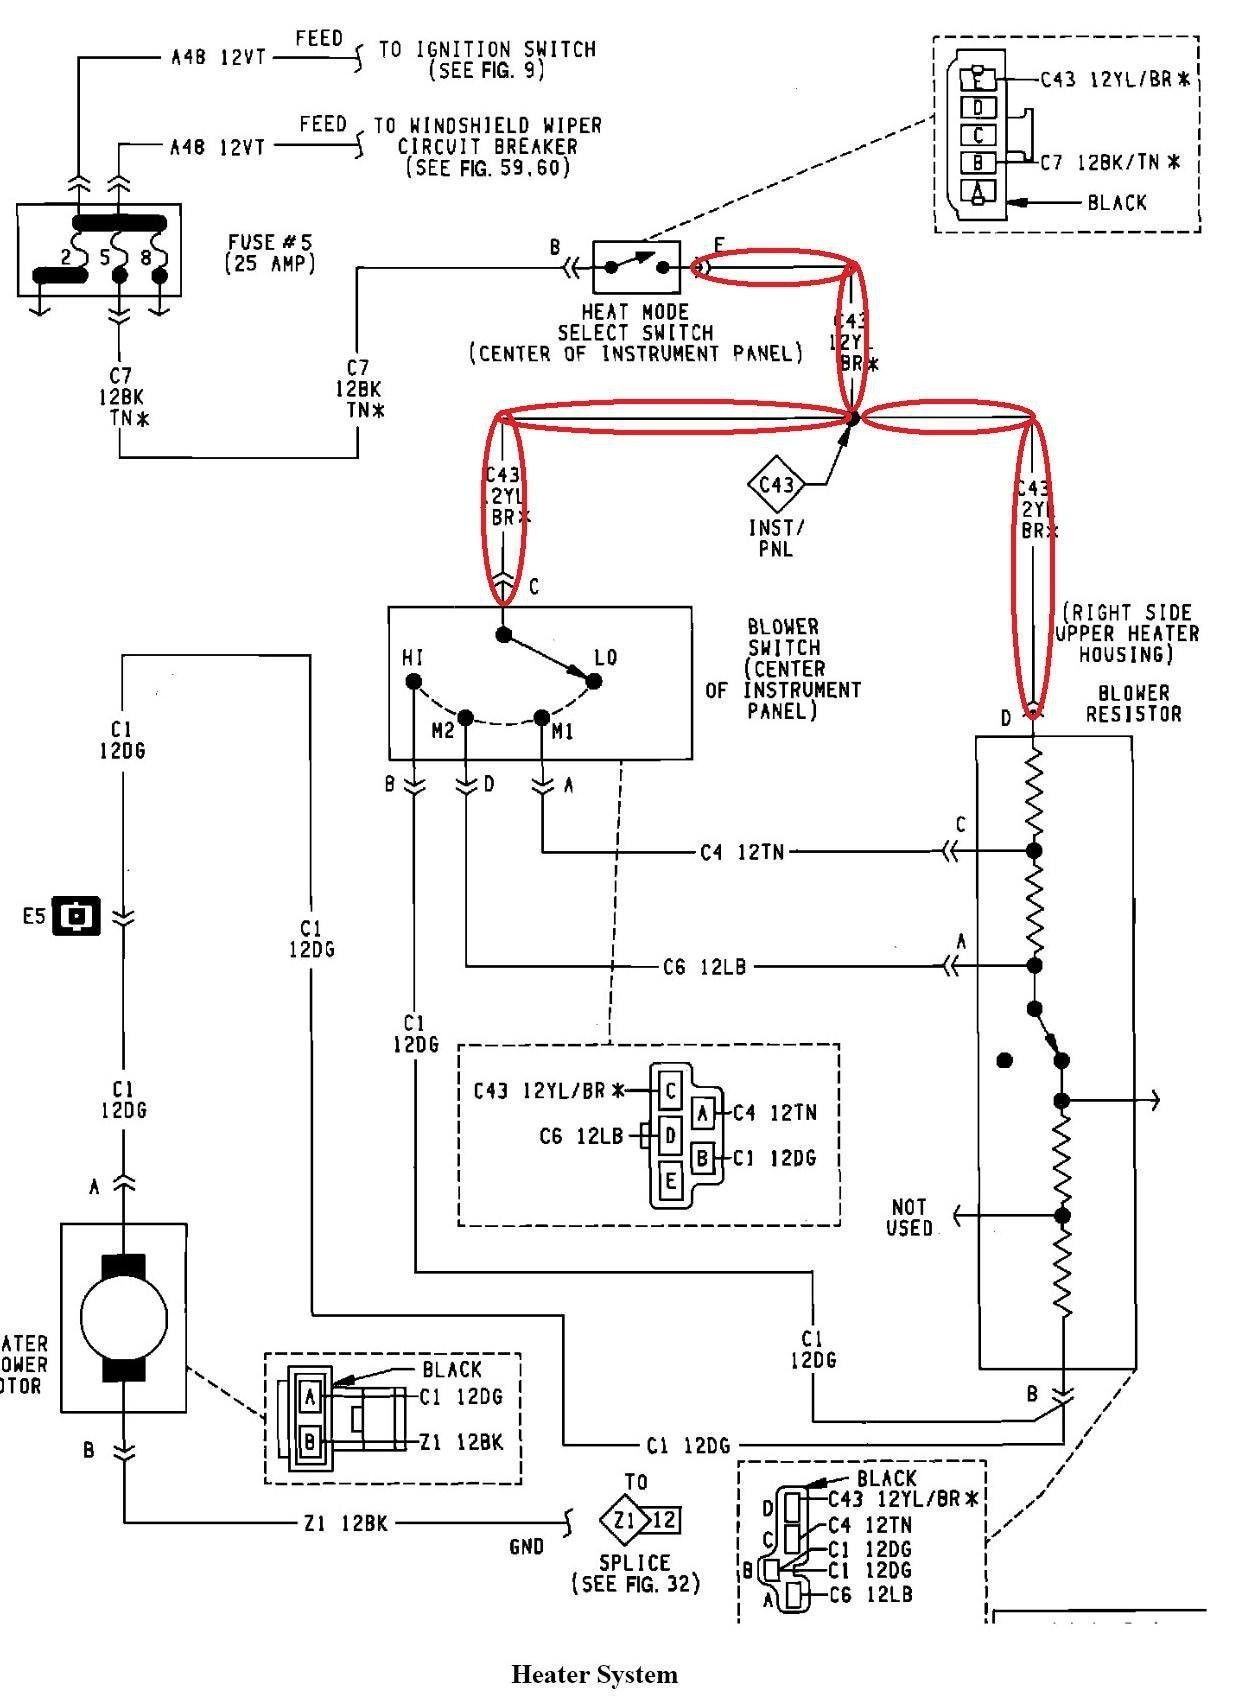 36v Wiring Diagram Wiring Diagram Mega 36v Motorcycle Wiring Diagram Source 36v electric scooter